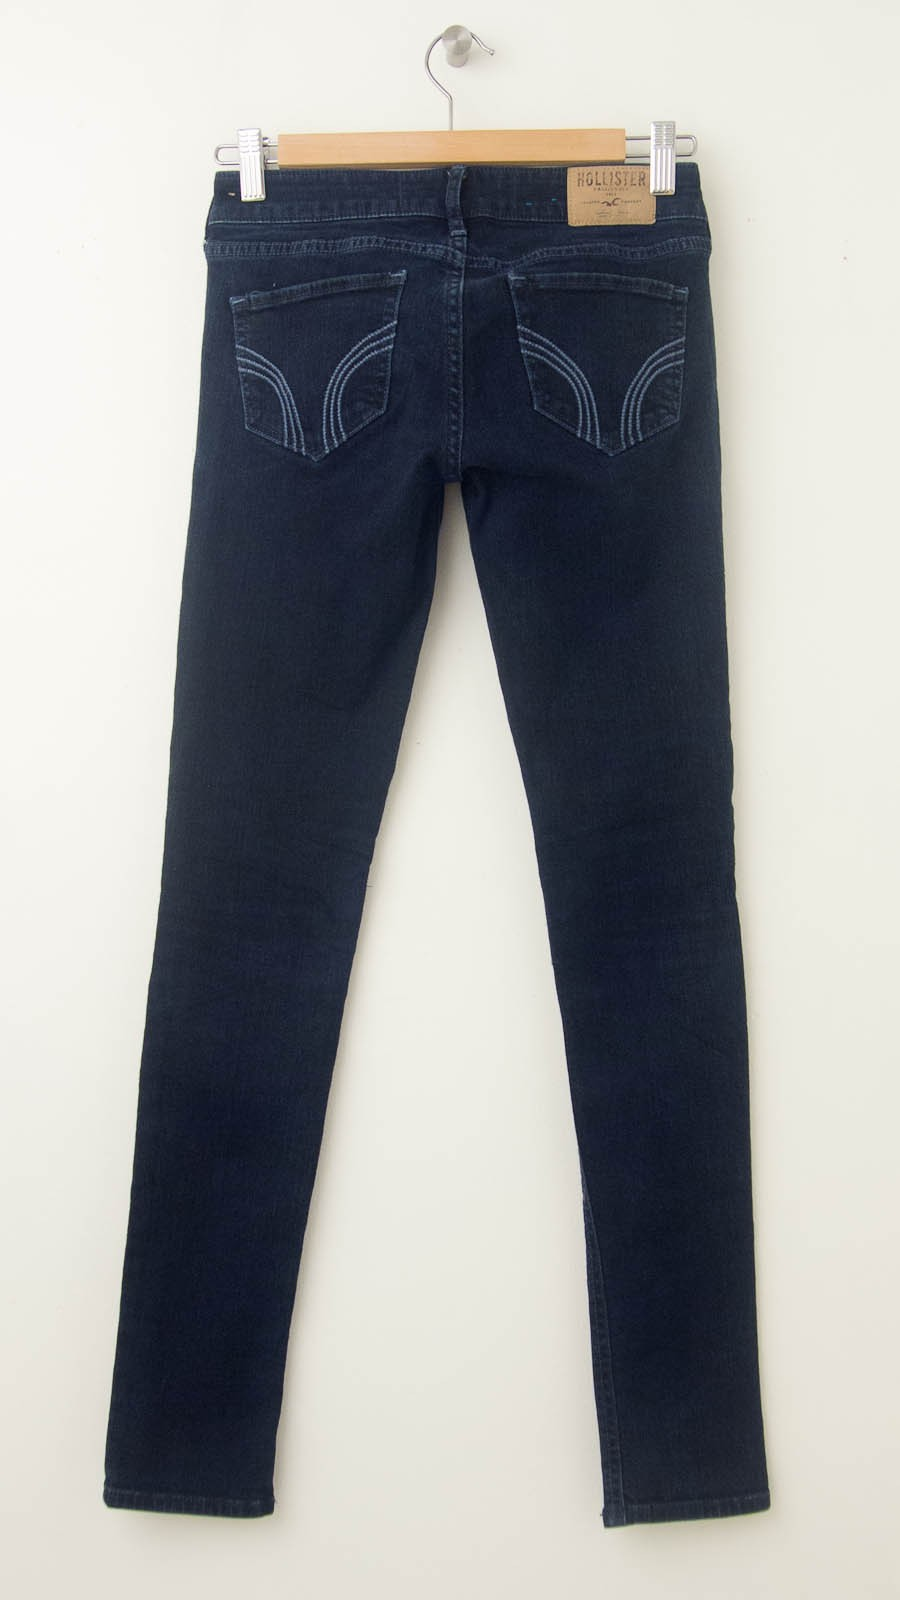 Super Skinny Jeans Women's 0S - Short - W24 L29